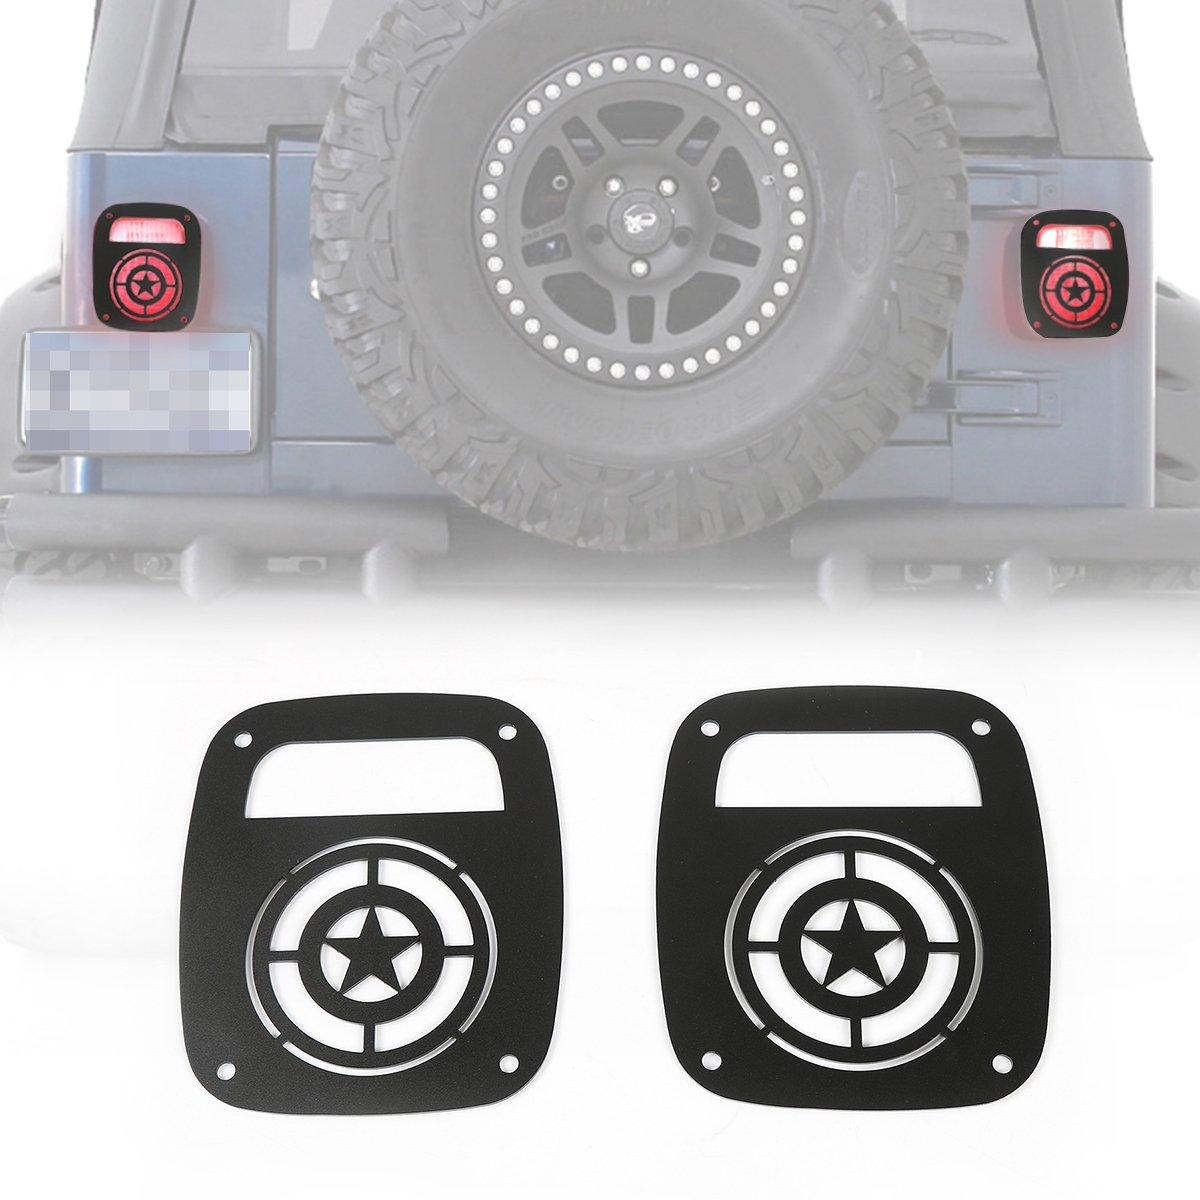 Pair 5 Stars RT-TCZ Aluminum Black Rear Taillights Light Guard Tail Light Cover For 1997-2006 Jeep Wrangler TJ